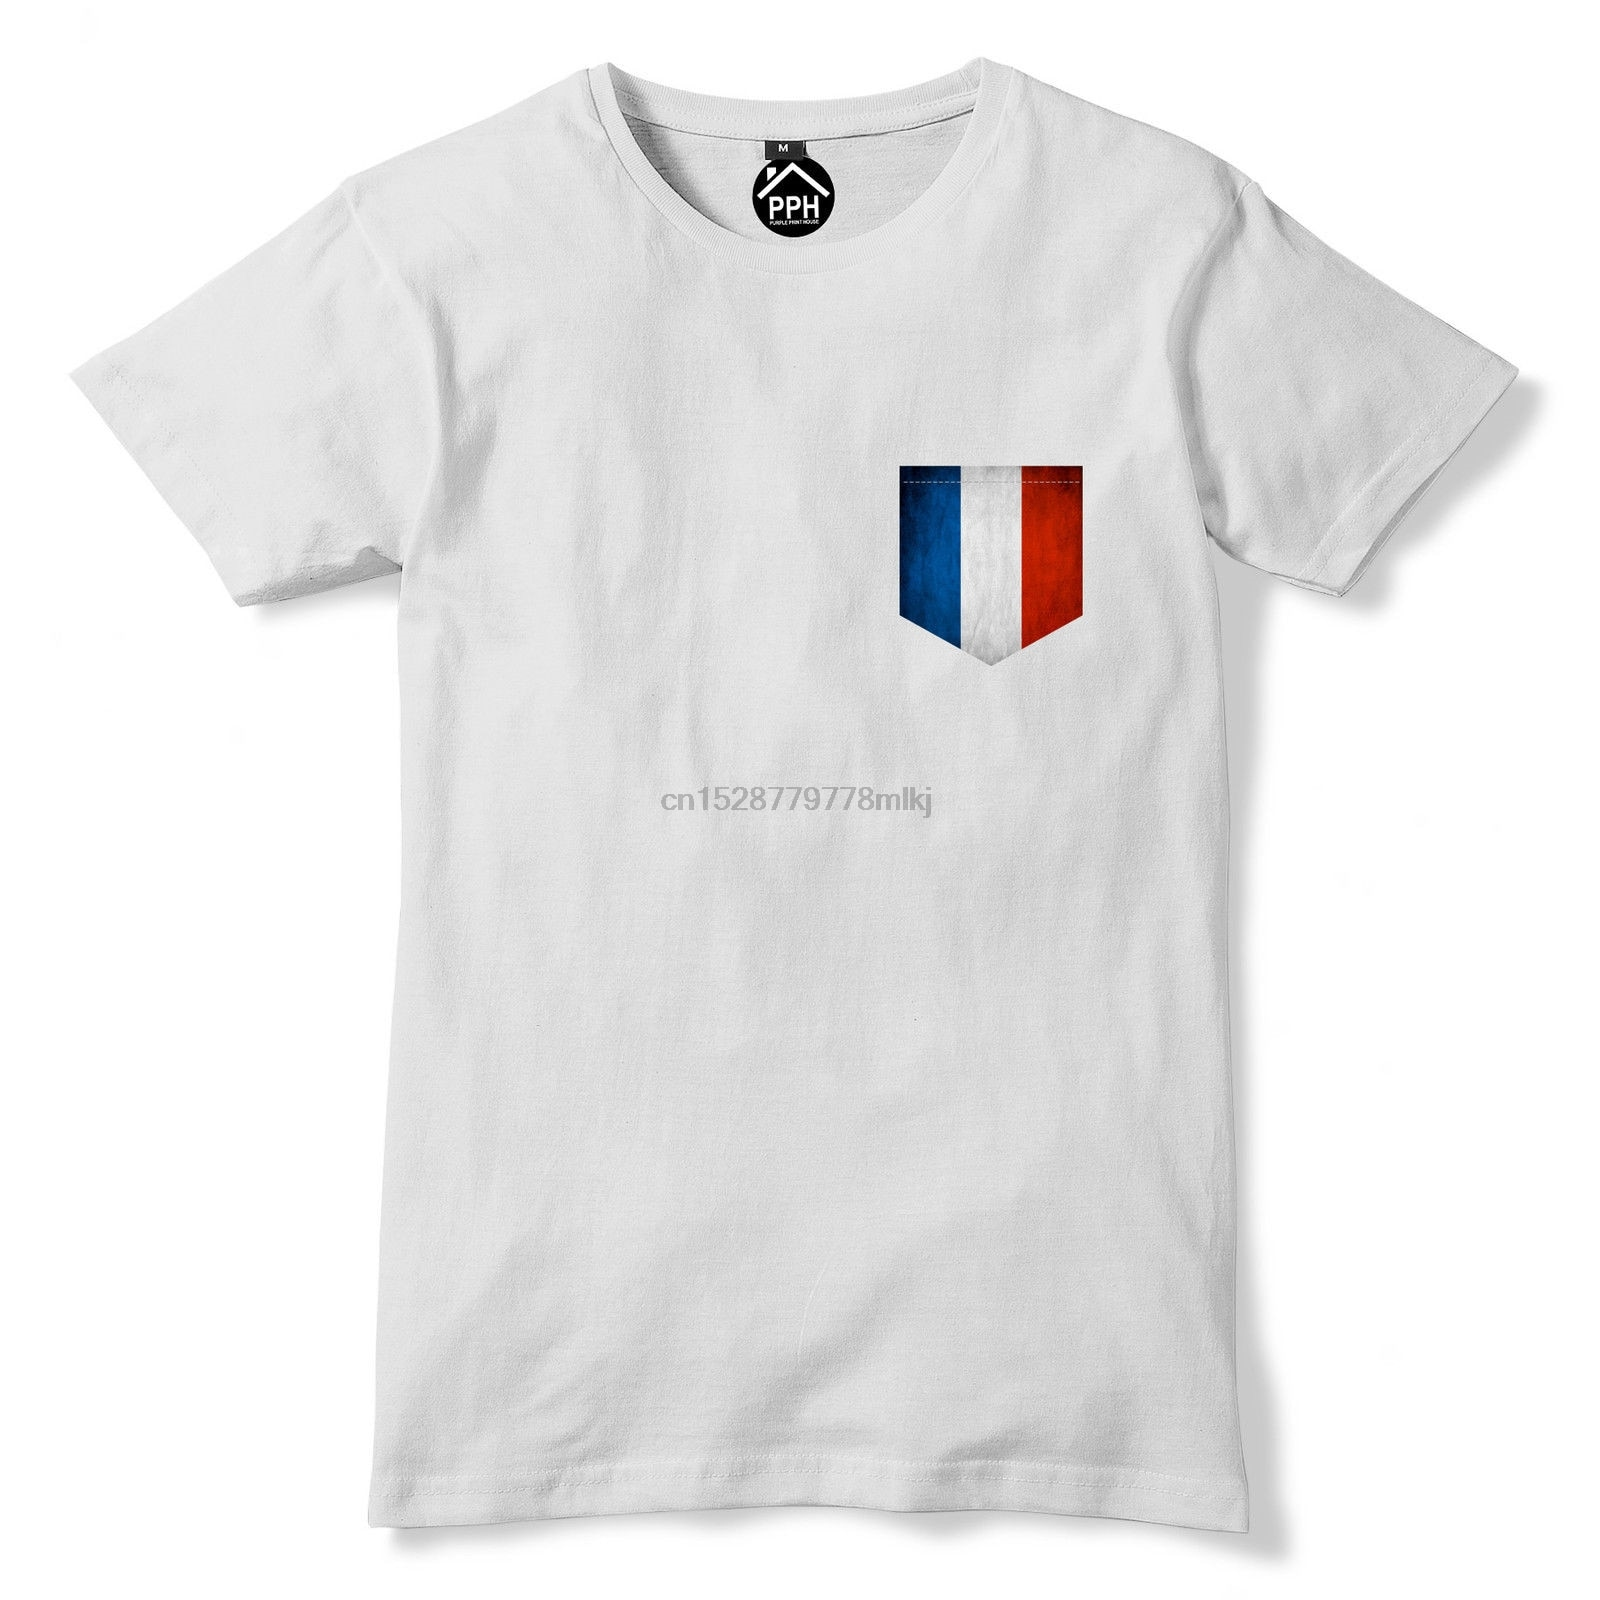 Shirt Tshirt Hipster Cool O Neck Tops Vintage Print Pocket France Flag T Shirt Footballer Franciase Sportercasual Homme Tshirt